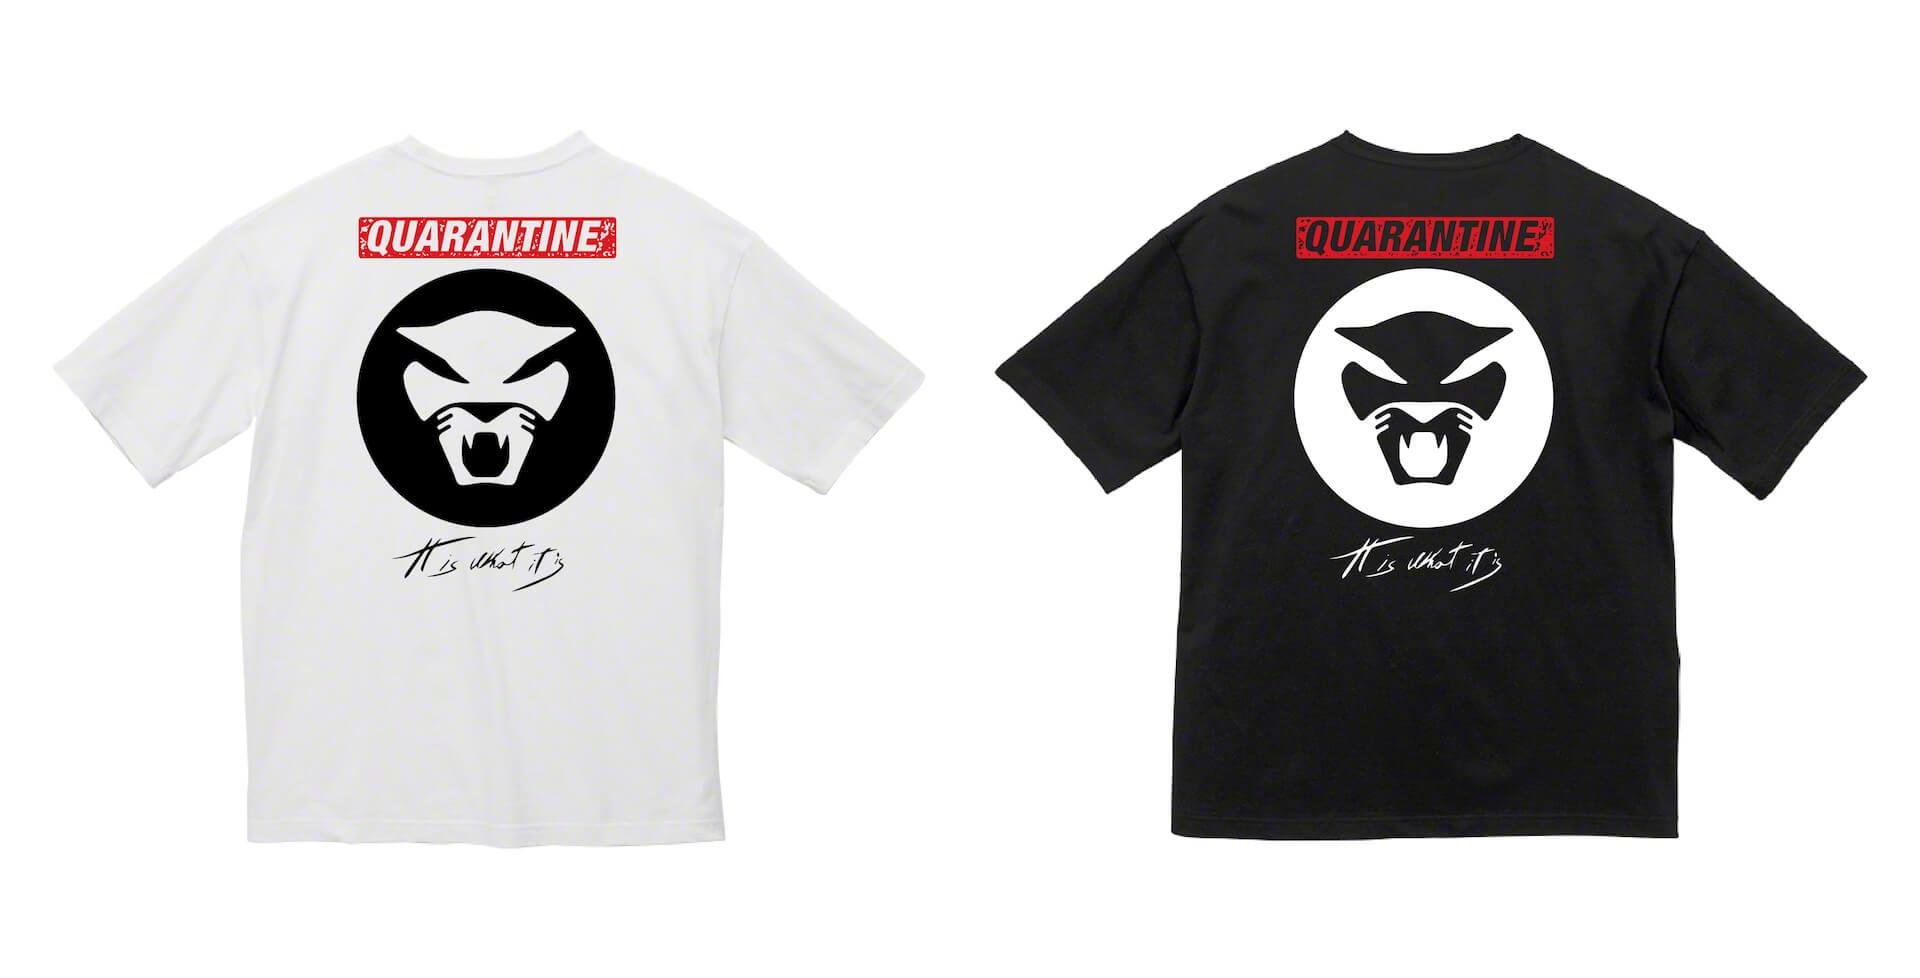 Thundercatがツアー延期Tシャツを発売!最新作『It Is What It Is』は自身初のオリコンチャートトップ10入り music200407_thundercat_tshirt_5